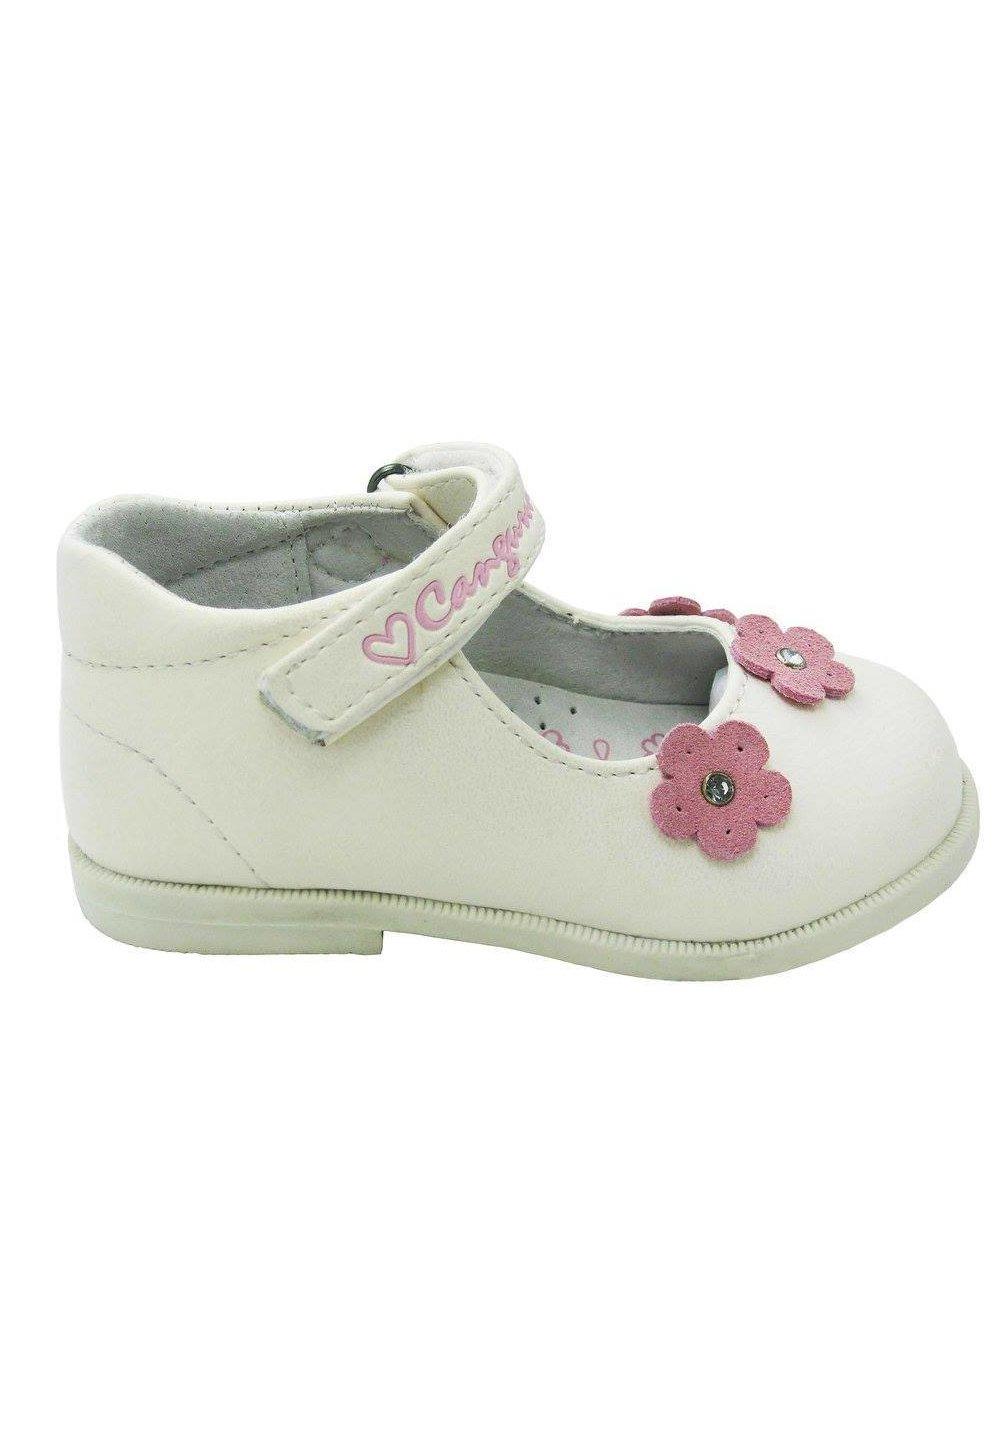 Pantofi, alb perlat, floricica imagine